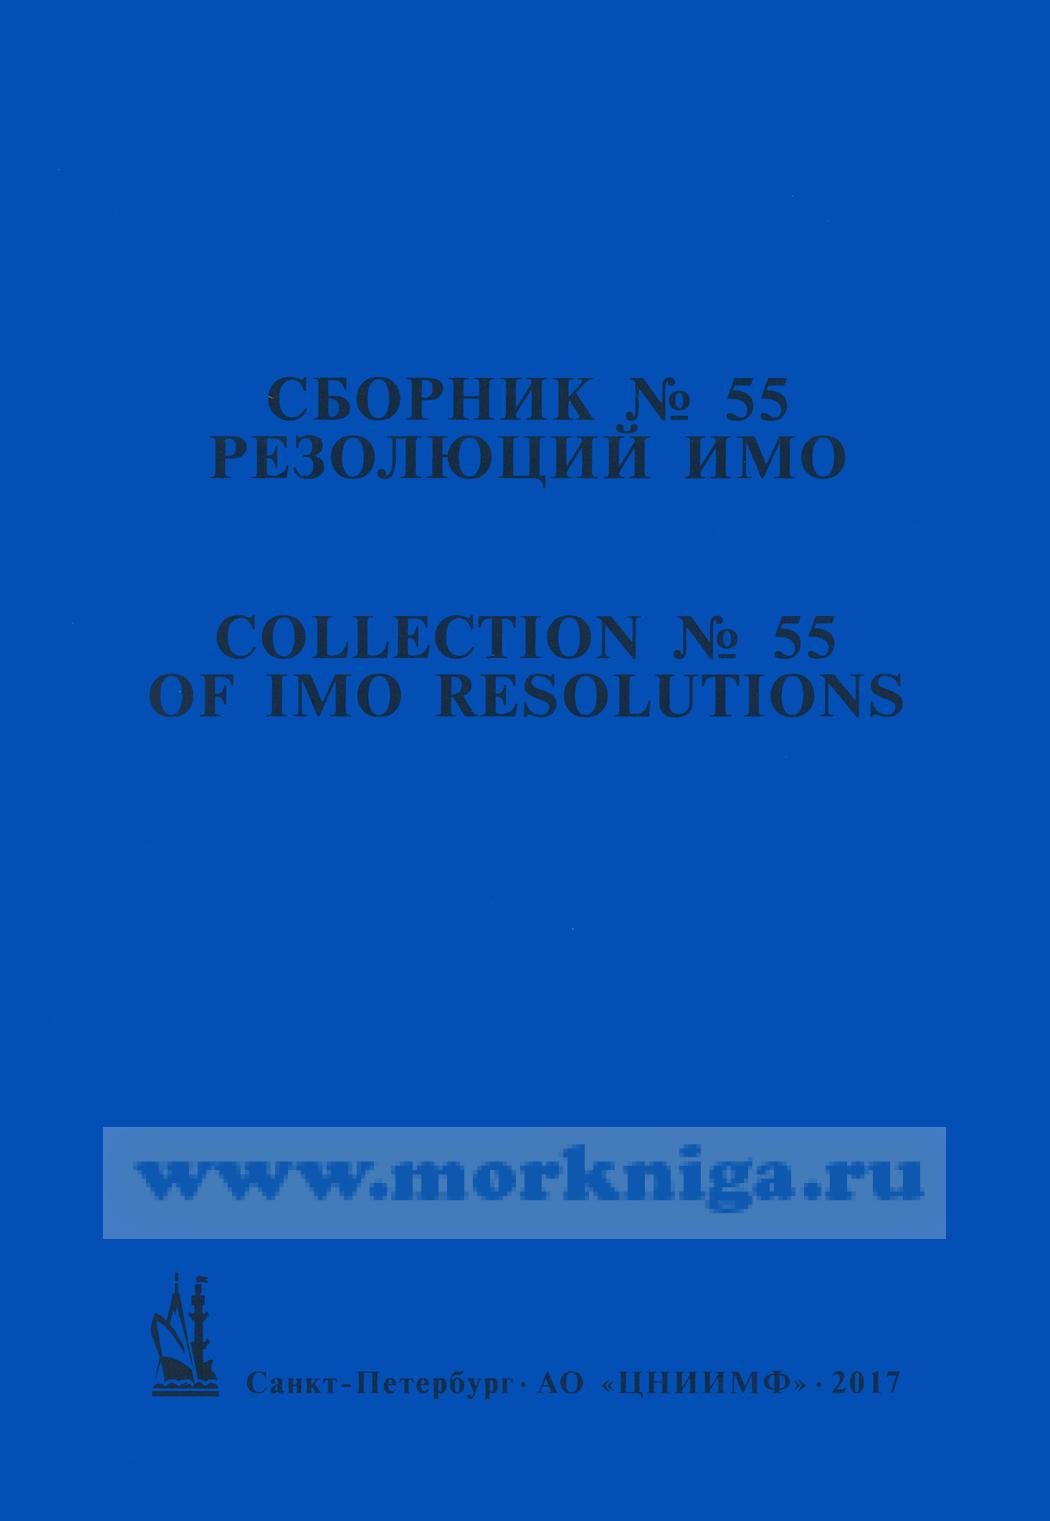 Сборник № 55 резолюций ИМО/ Collection No.55 of IMO Resolutions